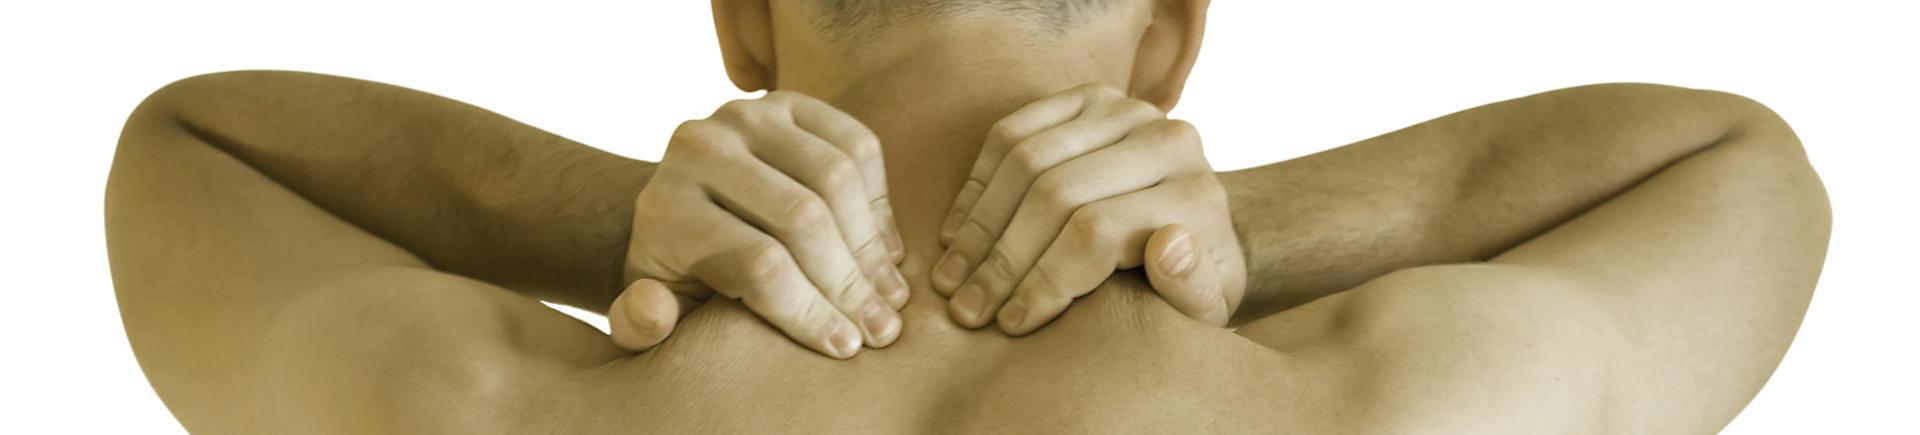 Man massaging his neck